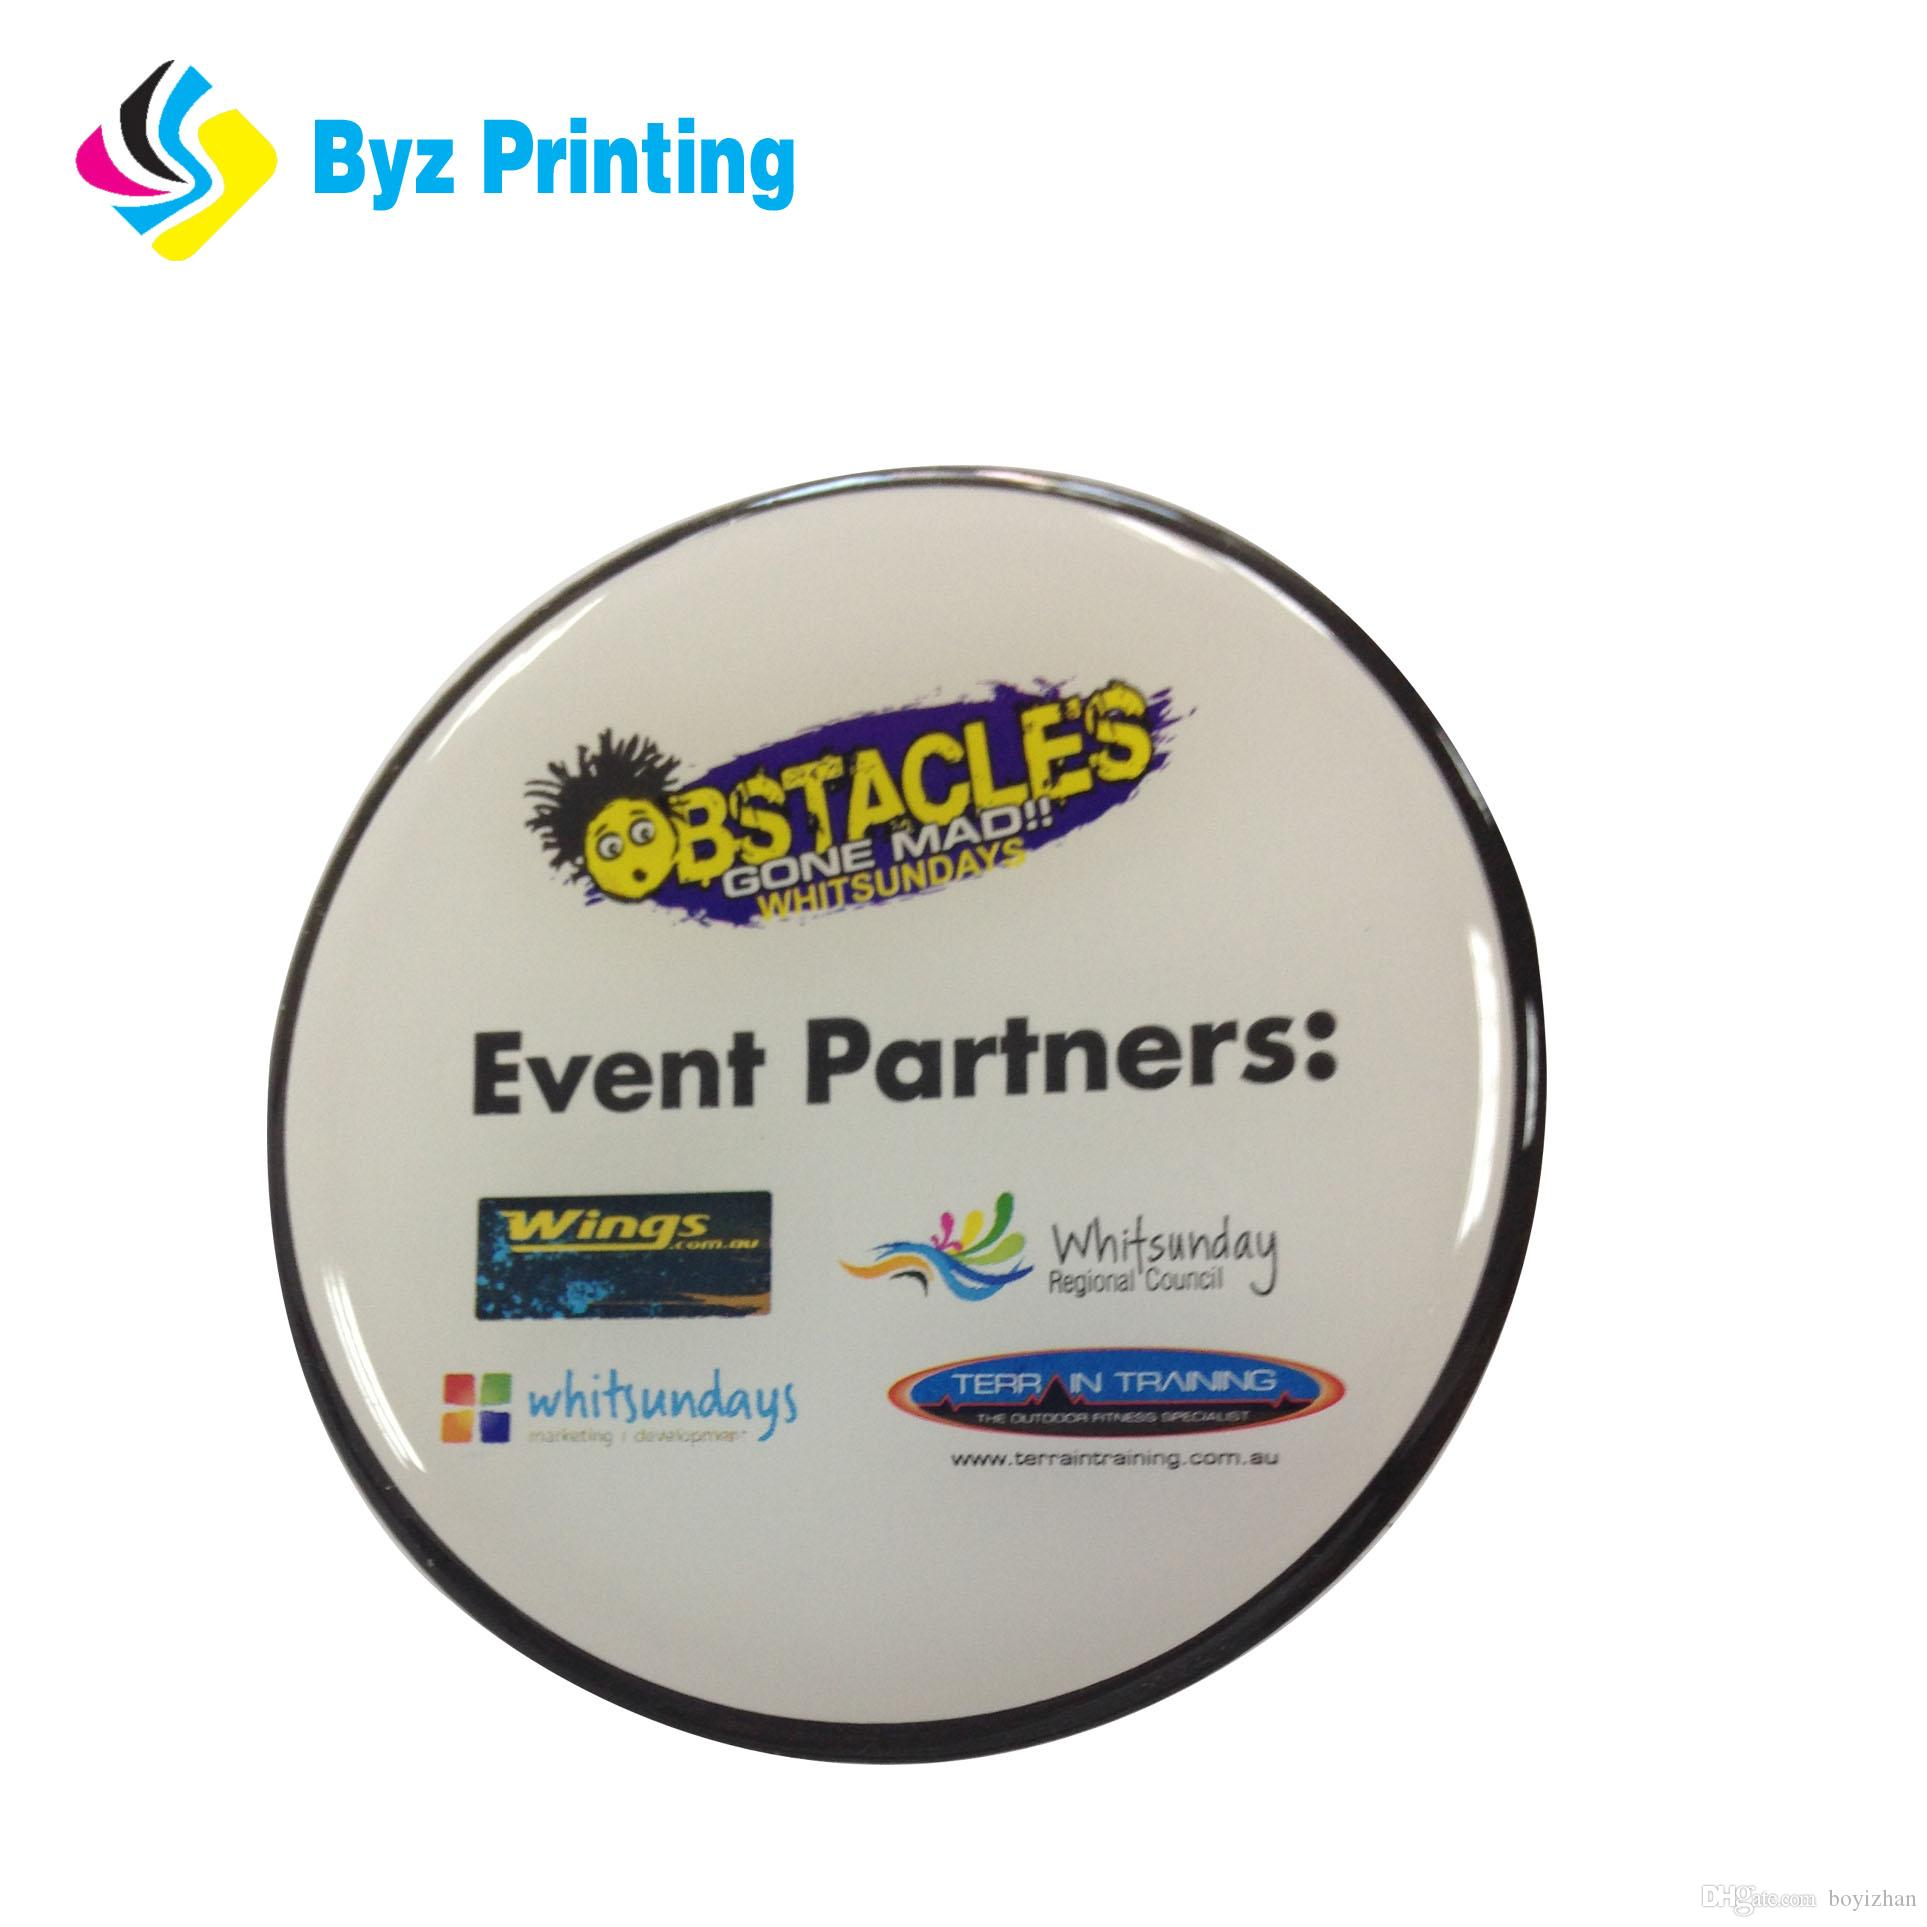 Hot selling customized epoxy sticker adhesive epoxy dome sticker clear graphic epoxy dome sticker